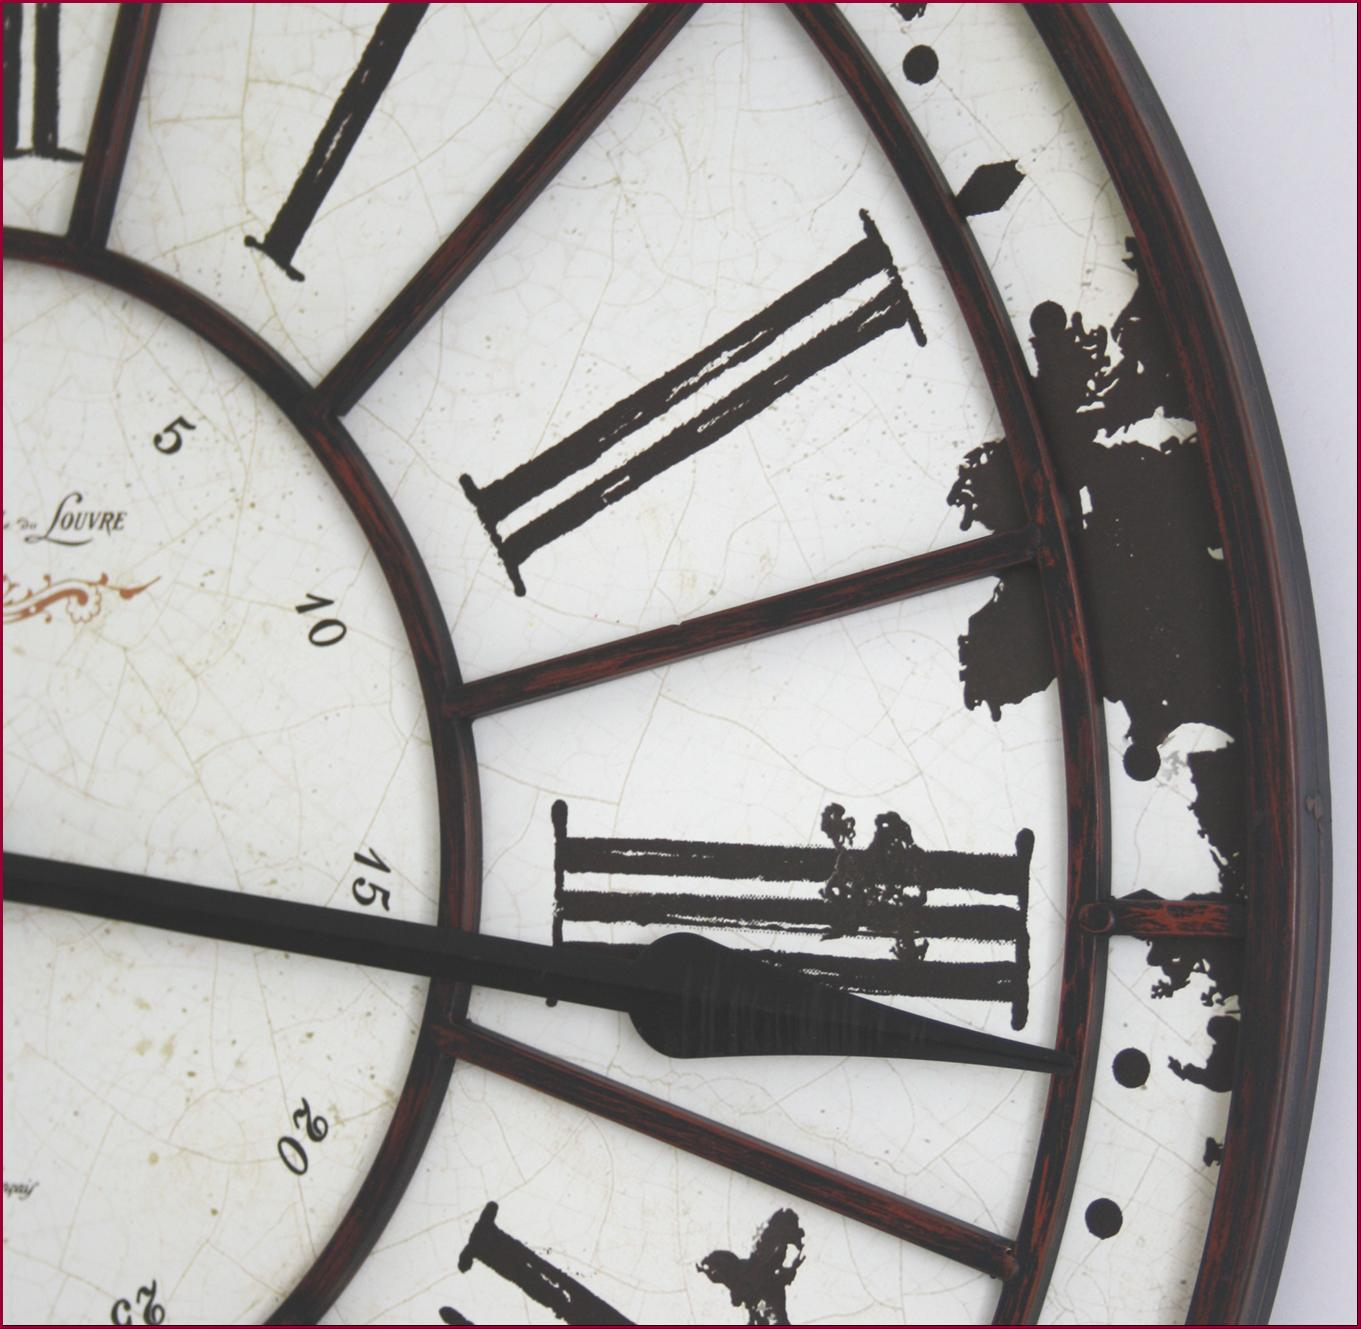 Grande Horloge Murale Cadre Cadran En Fer Forge 74cm Ebay